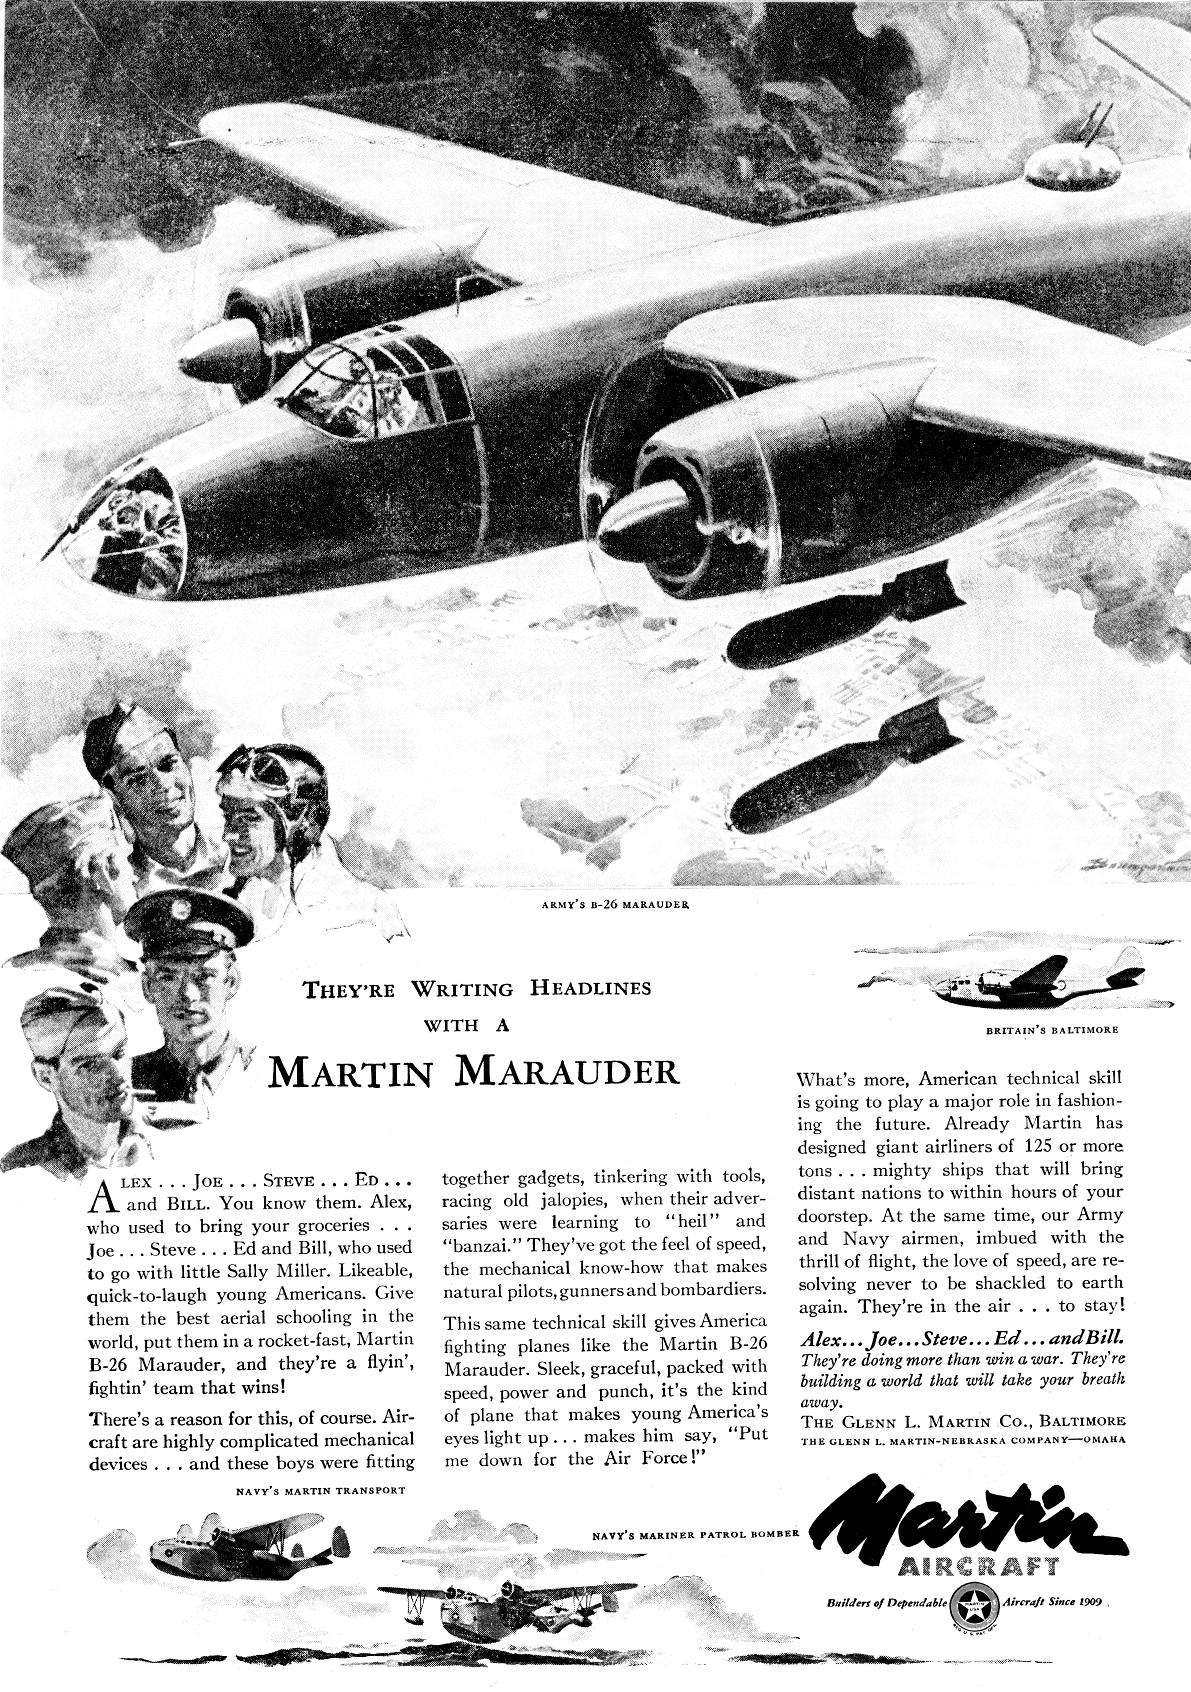 Pin By Frank Castrillo On Martin B 26 Marauder